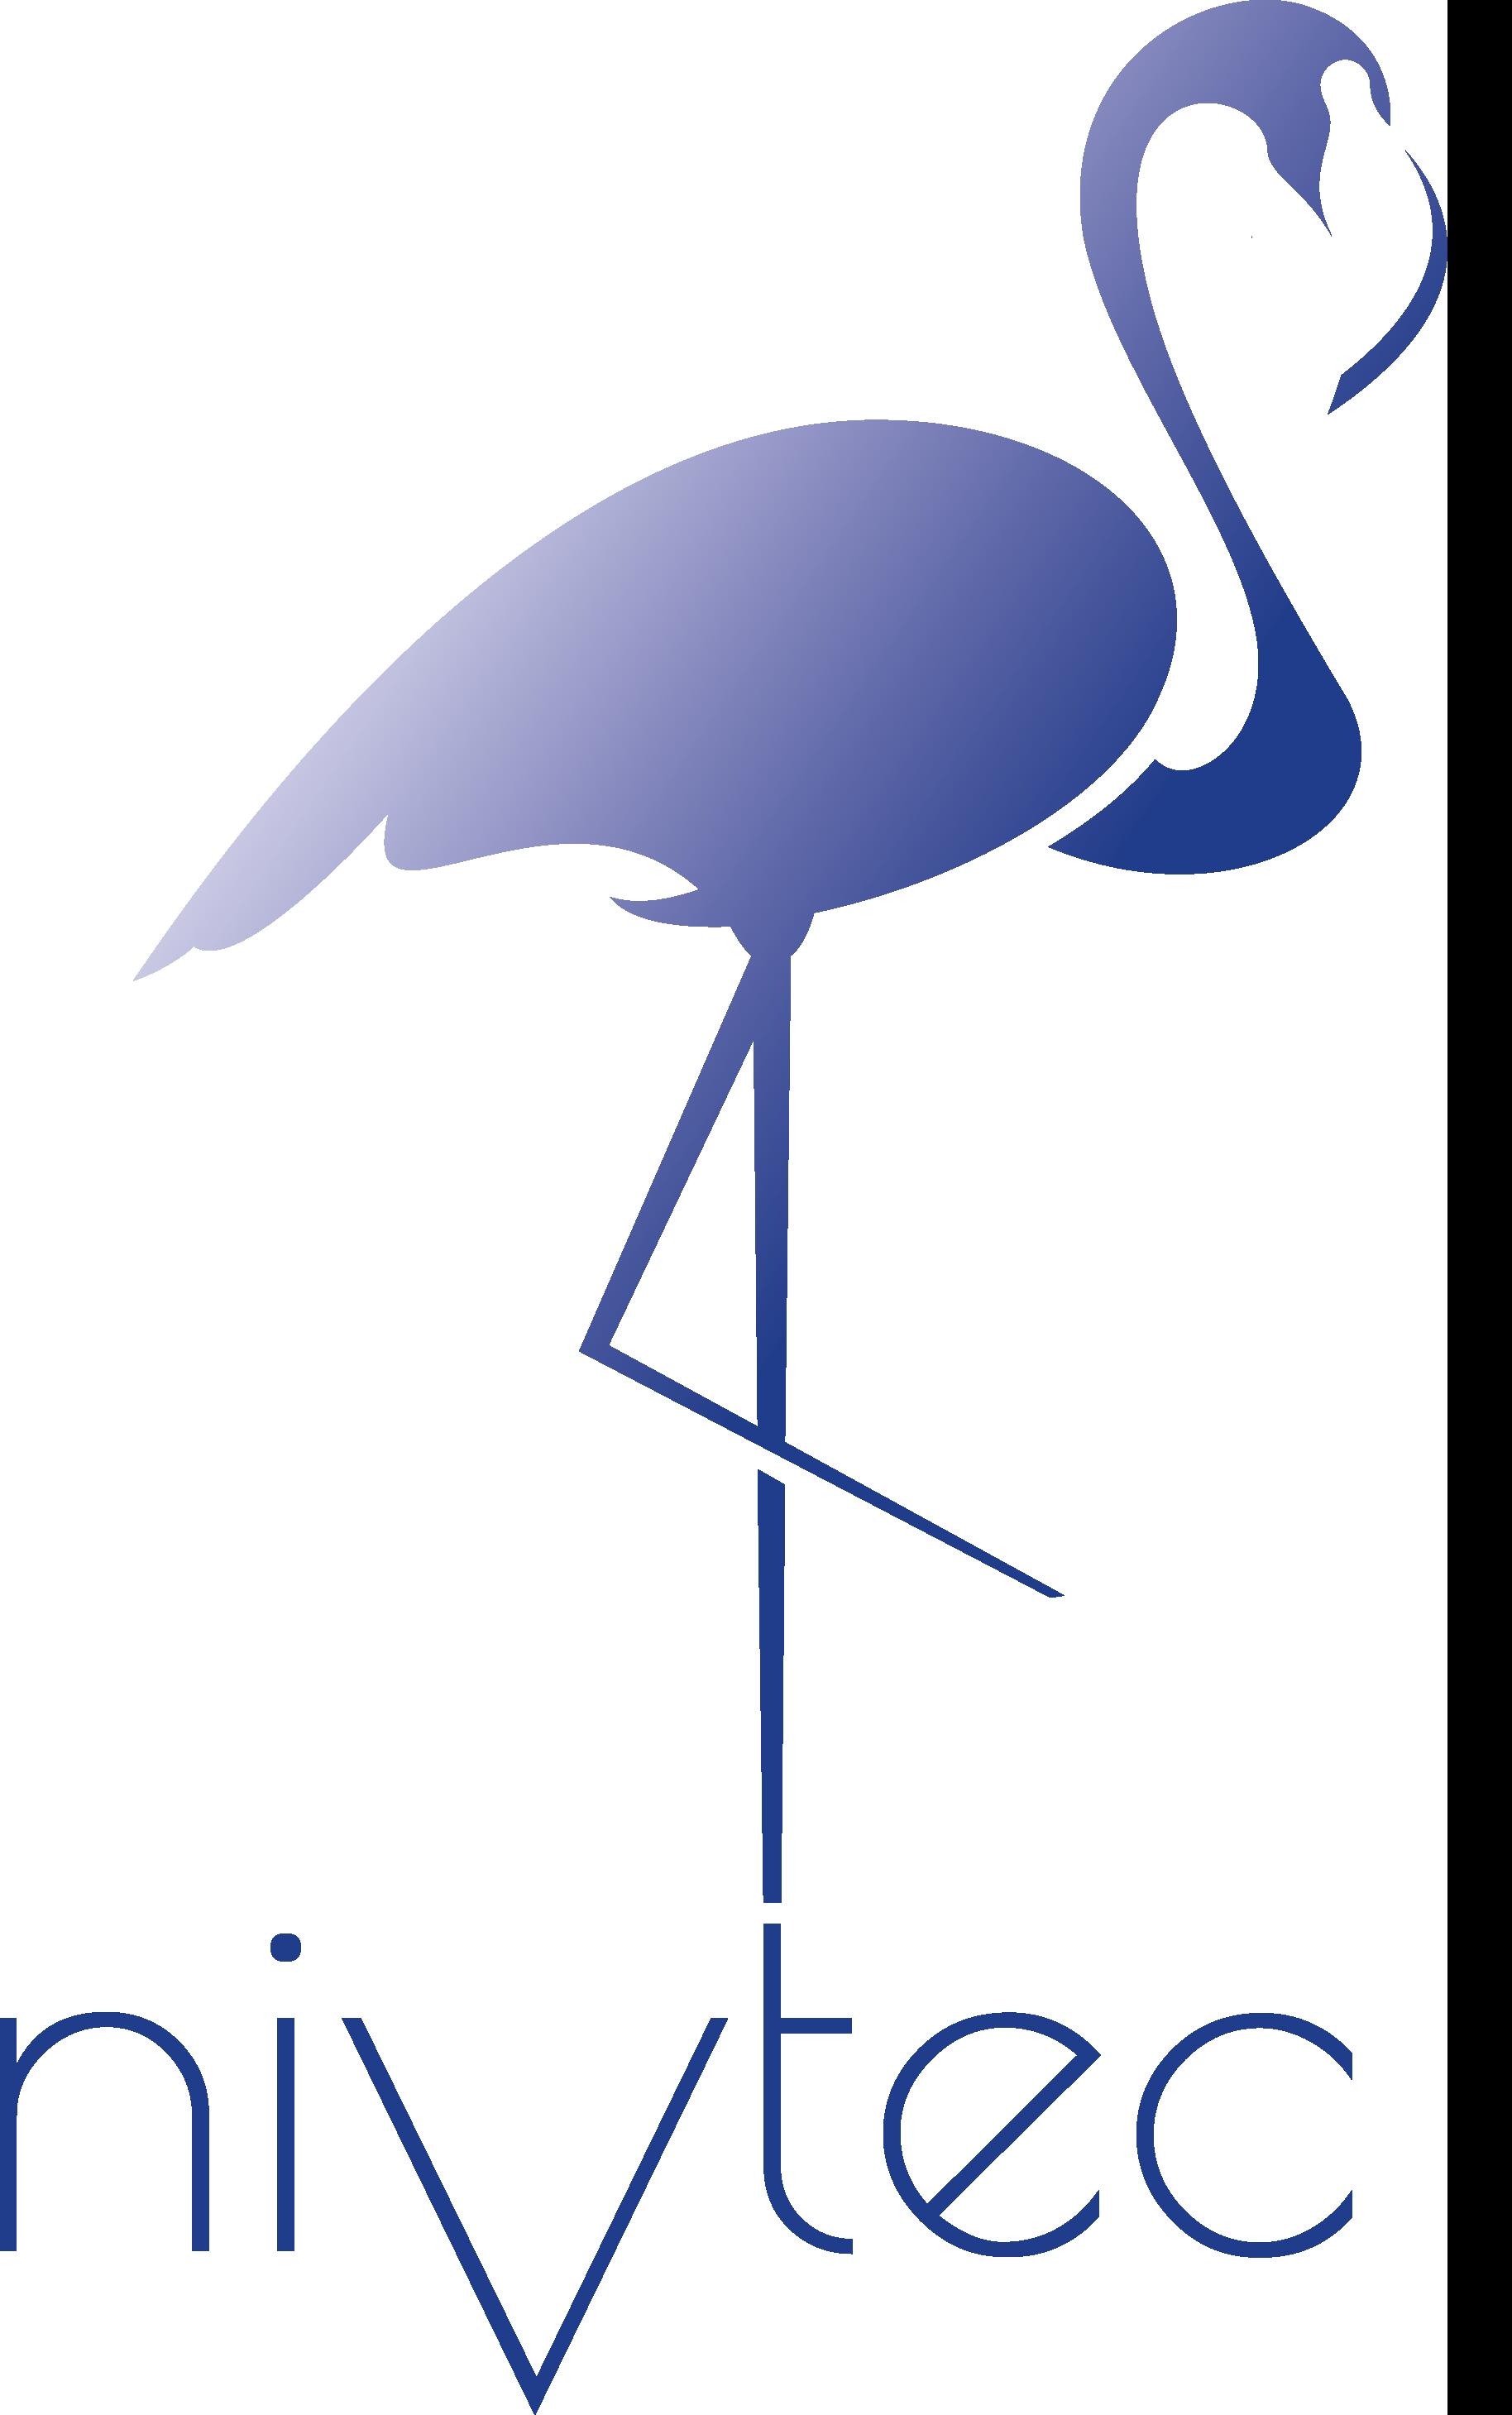 logo nivtec